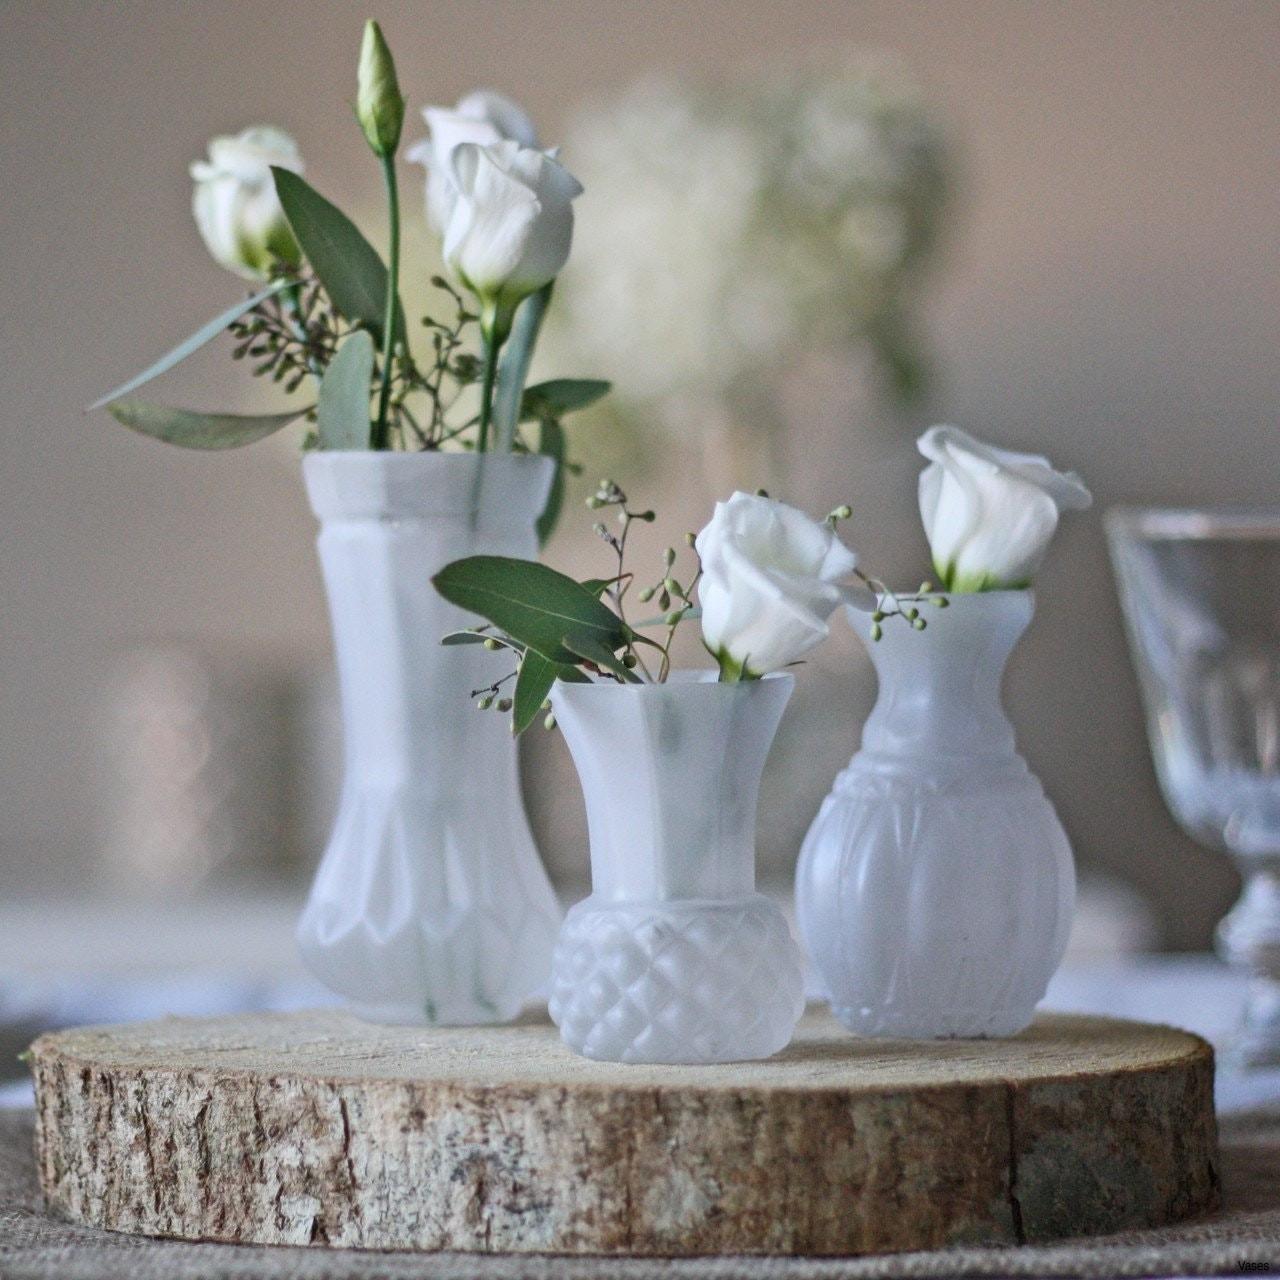 Tall Square Vases Of 21 Wedding Table Decorations Tall Vases Italib Net Regarding Wedding Table Decorations Tall Vases Lovely Jar Flower 1h Vases Bud Wedding Vase Centerpiece Idea I